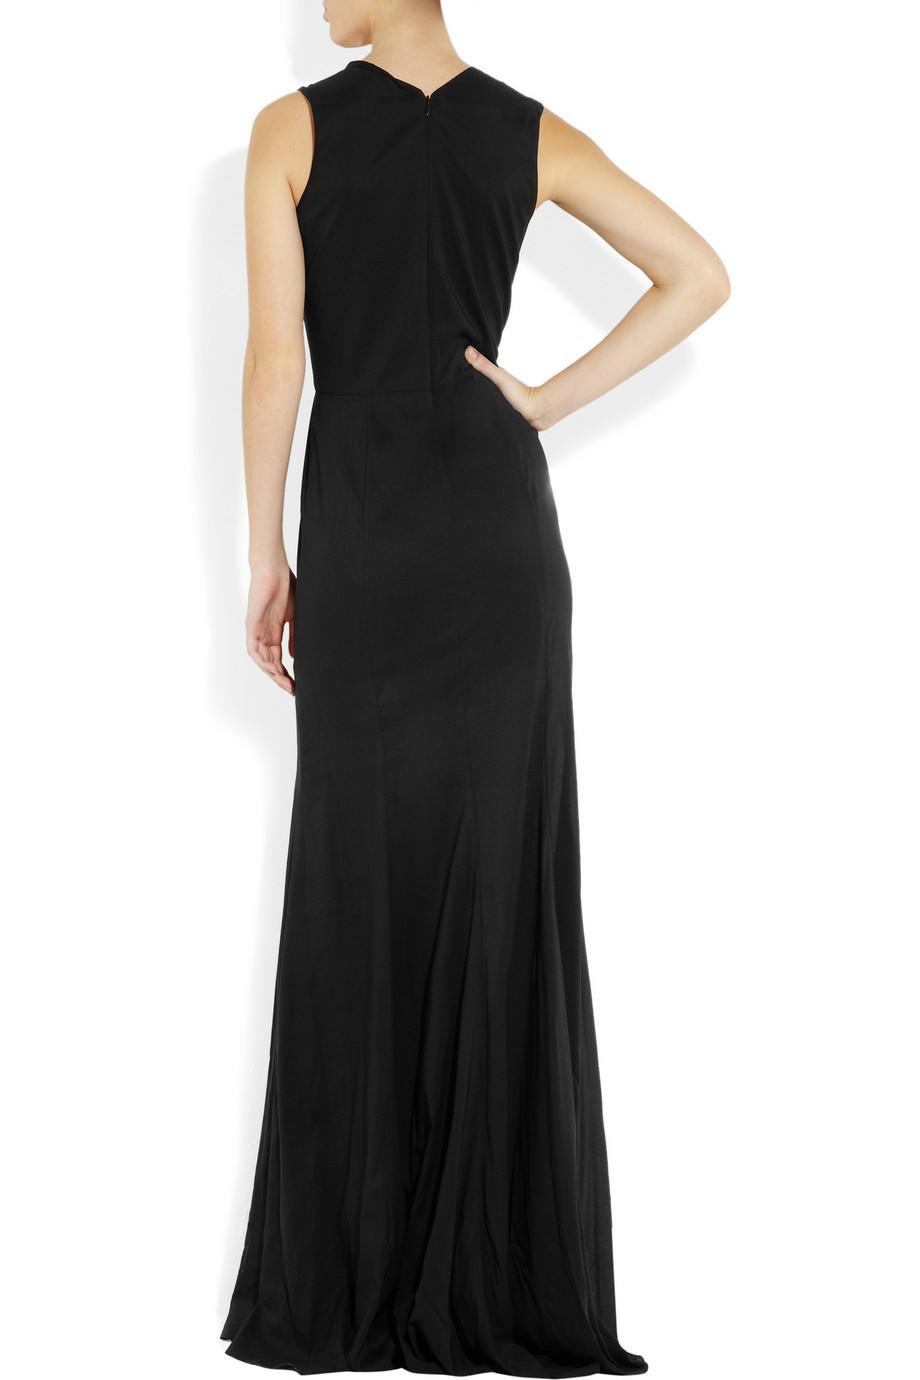 Theyskens' Theory Darisa Stretch Silk Gown in Black